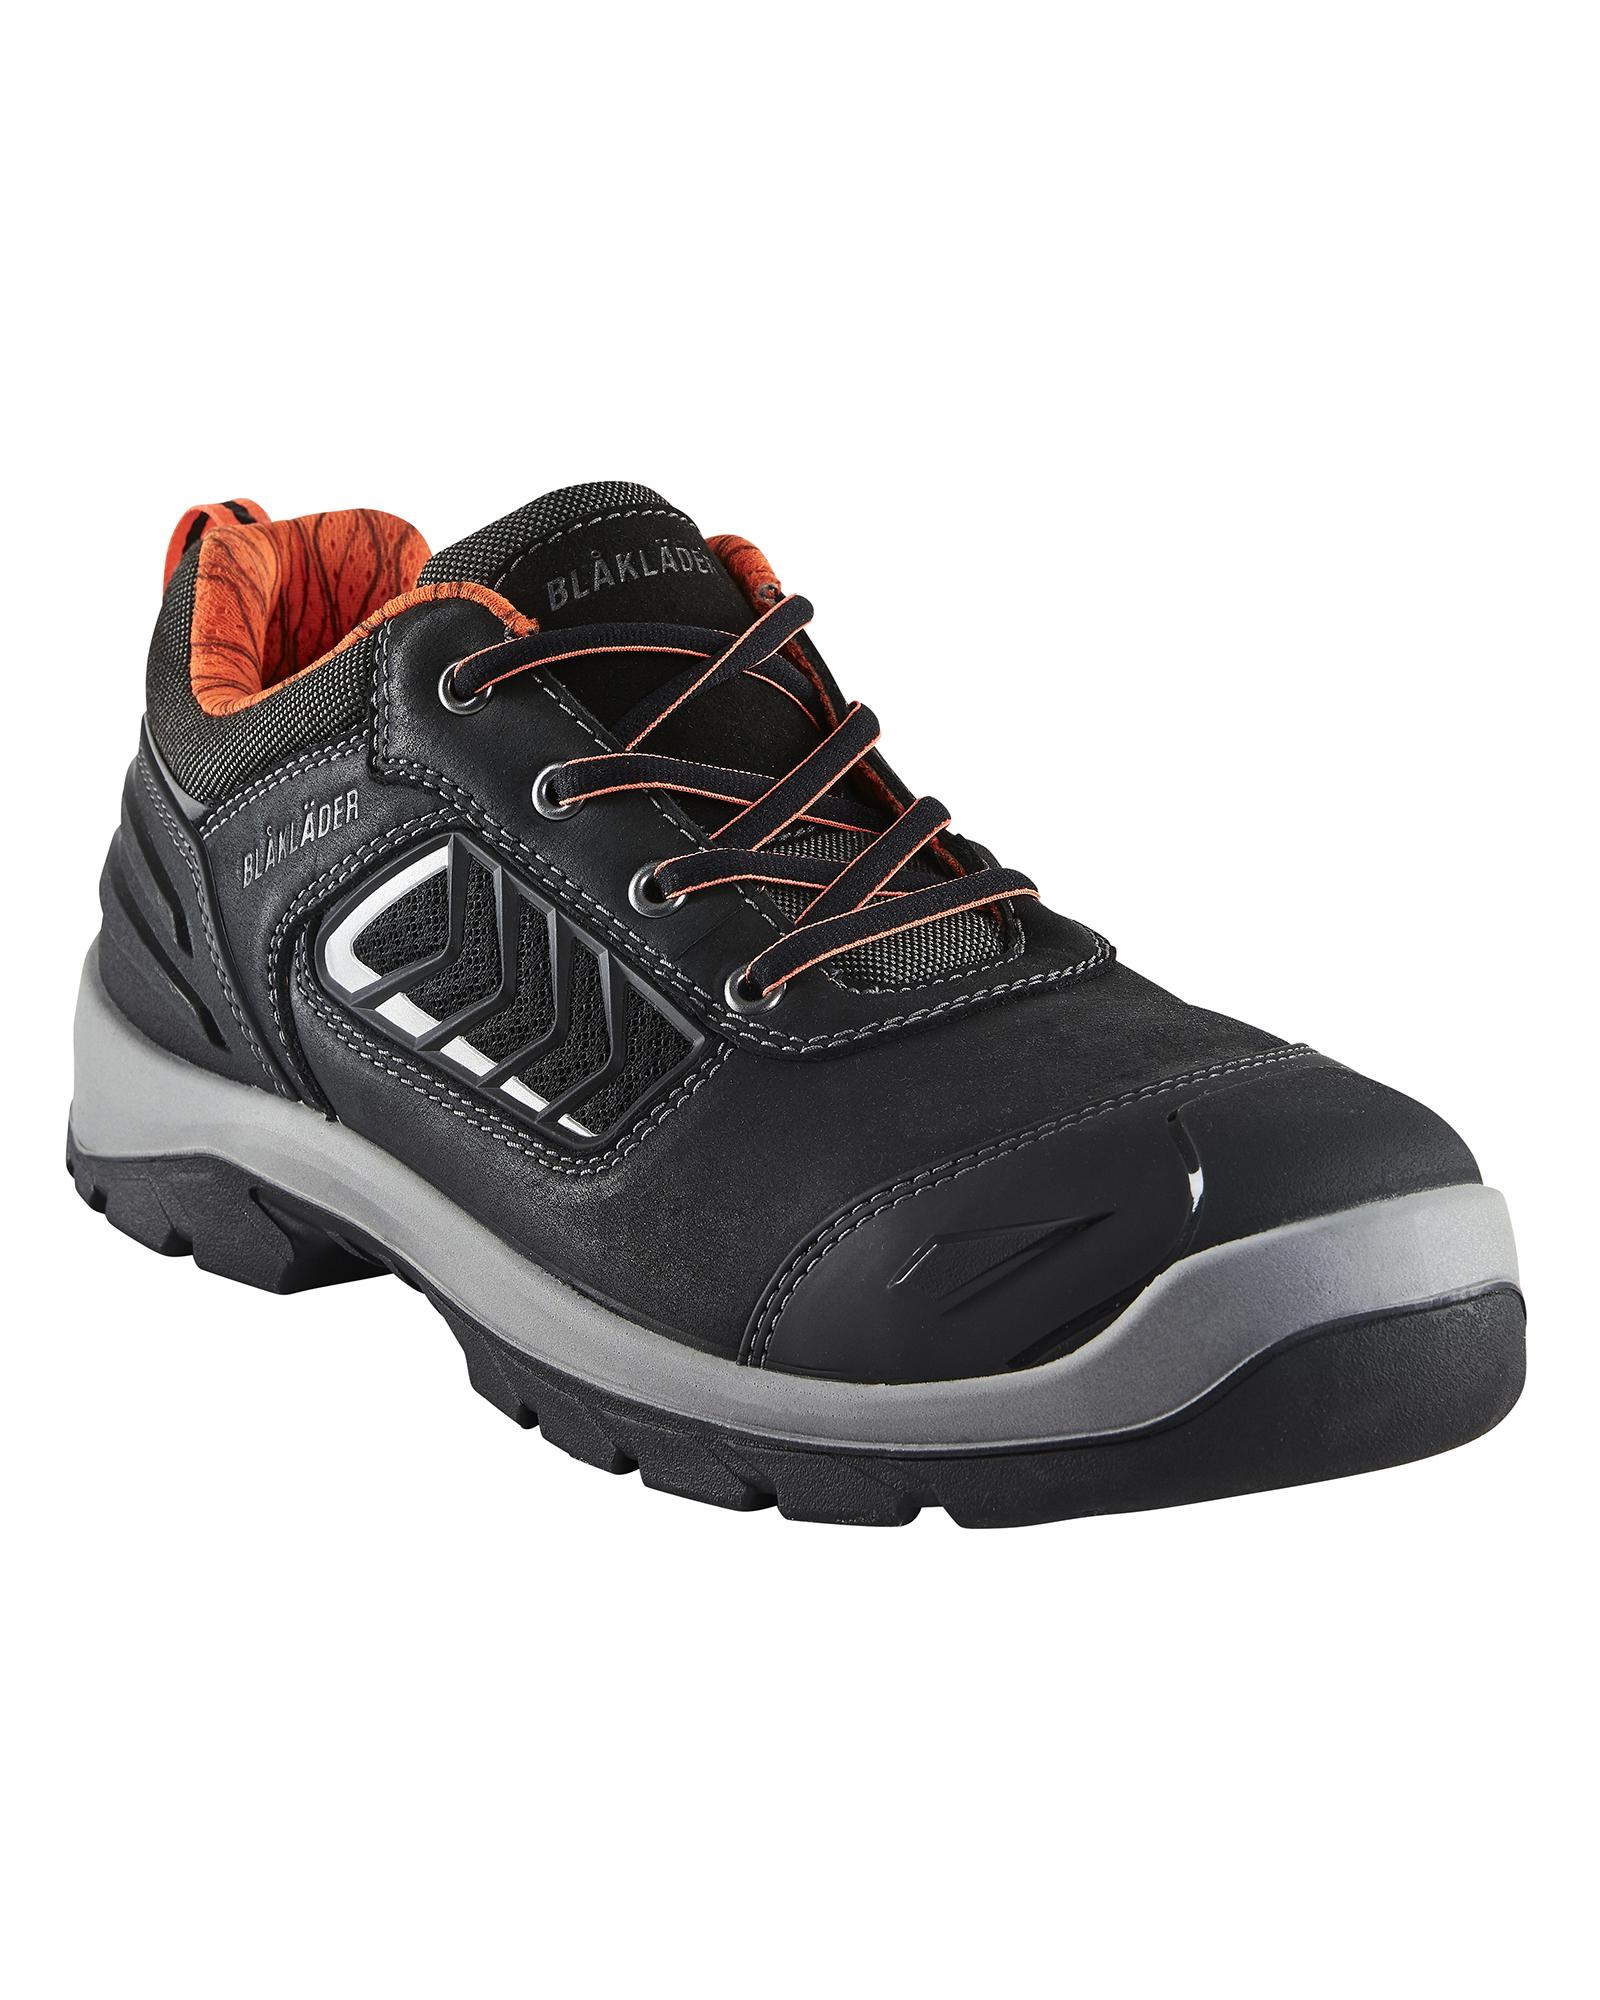 Safety shoe S3 BLKL€DER 2450 ELITE